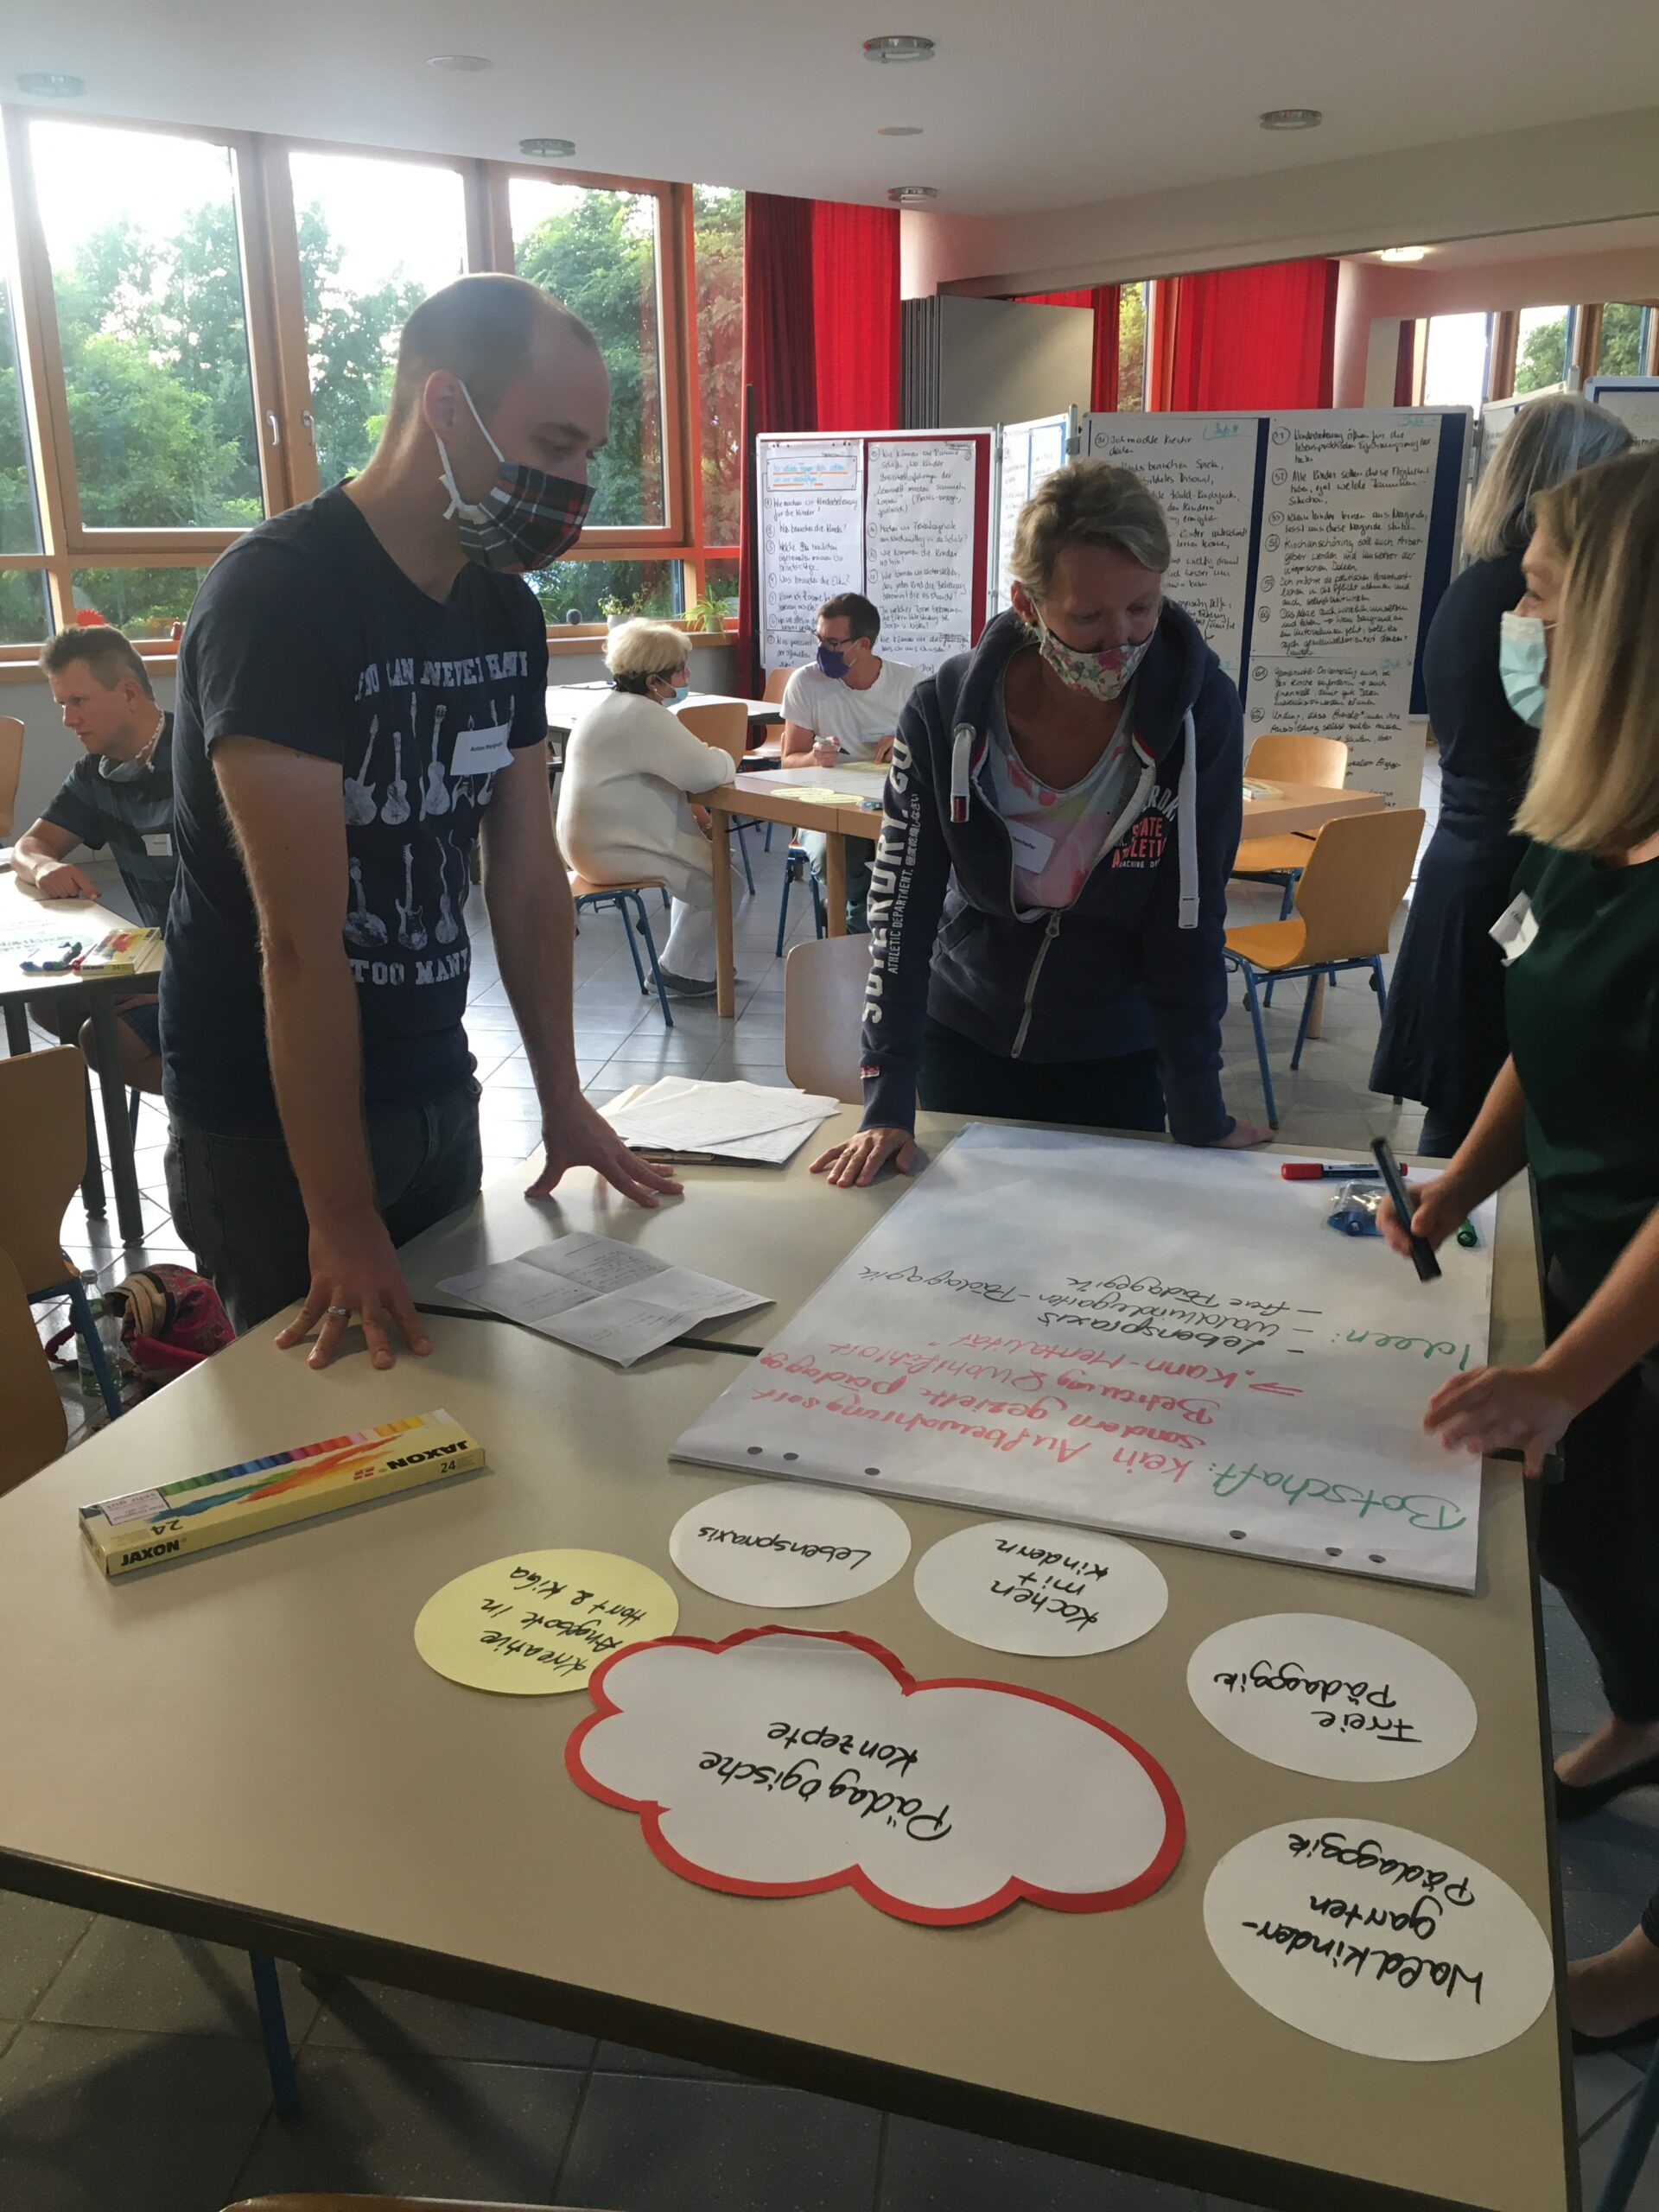 Gruppenarbeit im Bürgerrat - intensiver Austausch zu den Ideen und Lösungen